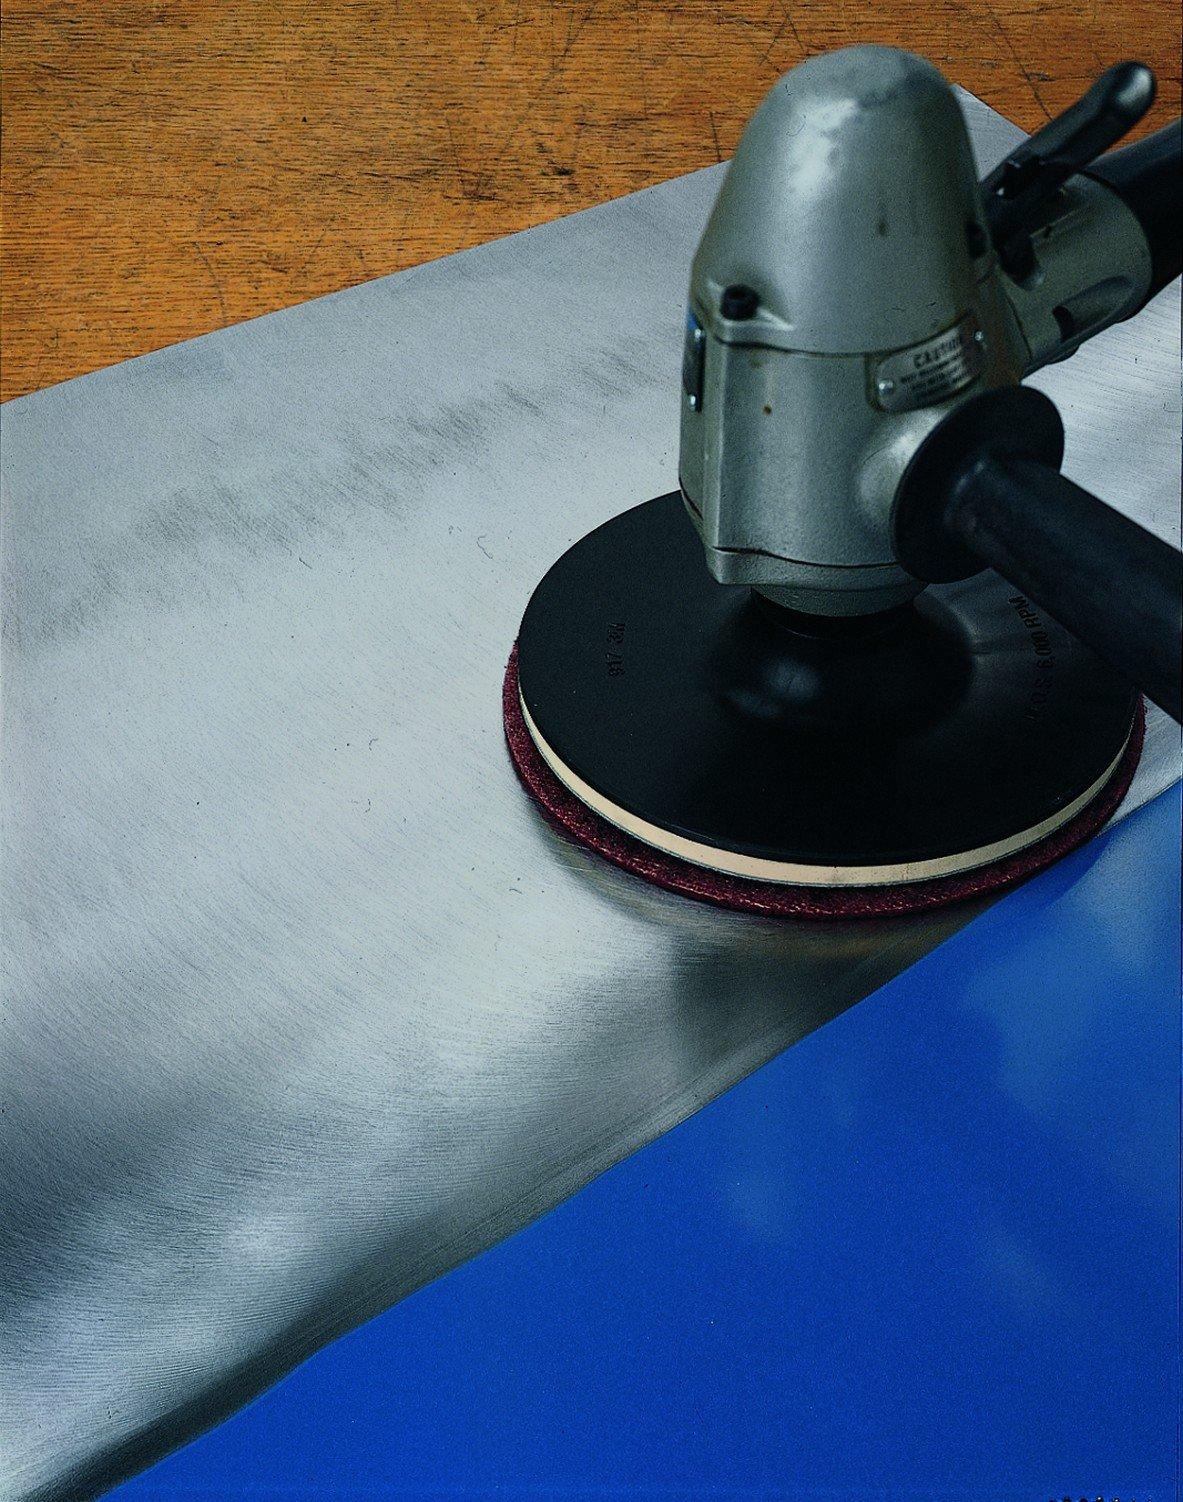 Scotch-Brite(TM) Surface Conditioning Disc 07450, Aluminum Oxide, 4'' Diameter, Coarse Grit, Brown  (Pack of 40)